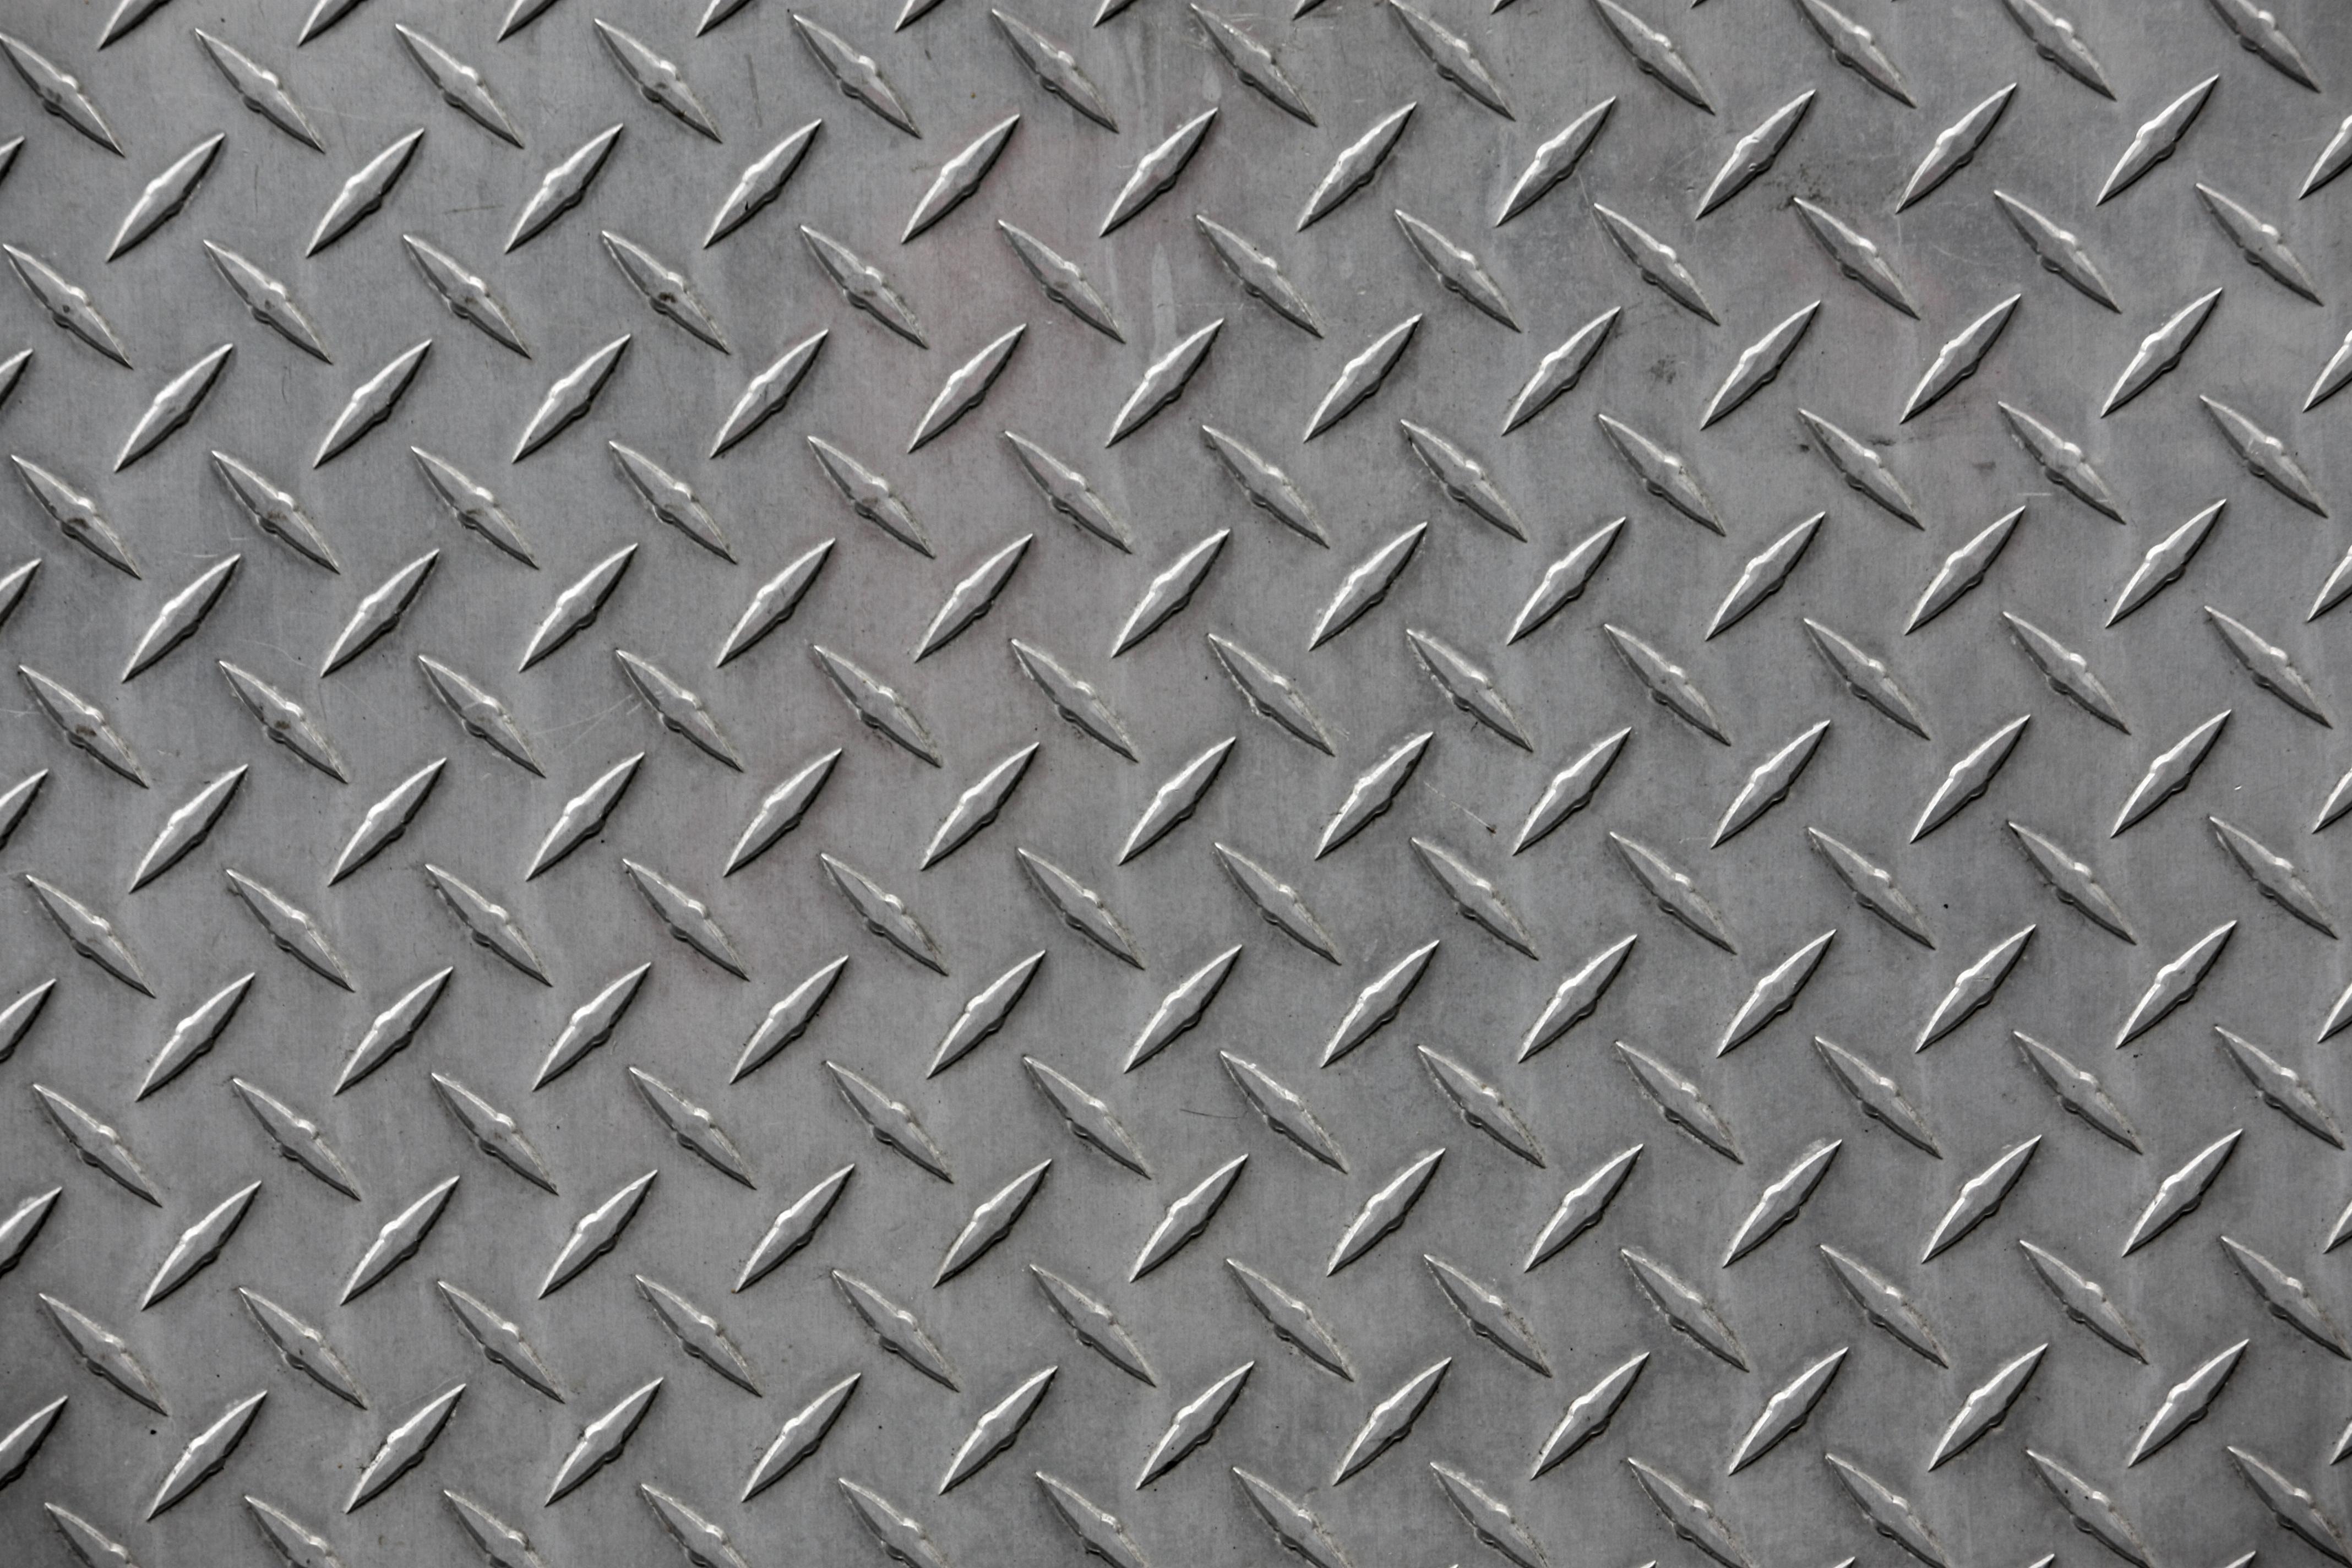 Debonair Aluminum Embossed Diamond Plates H Bright Reflective Finish ...